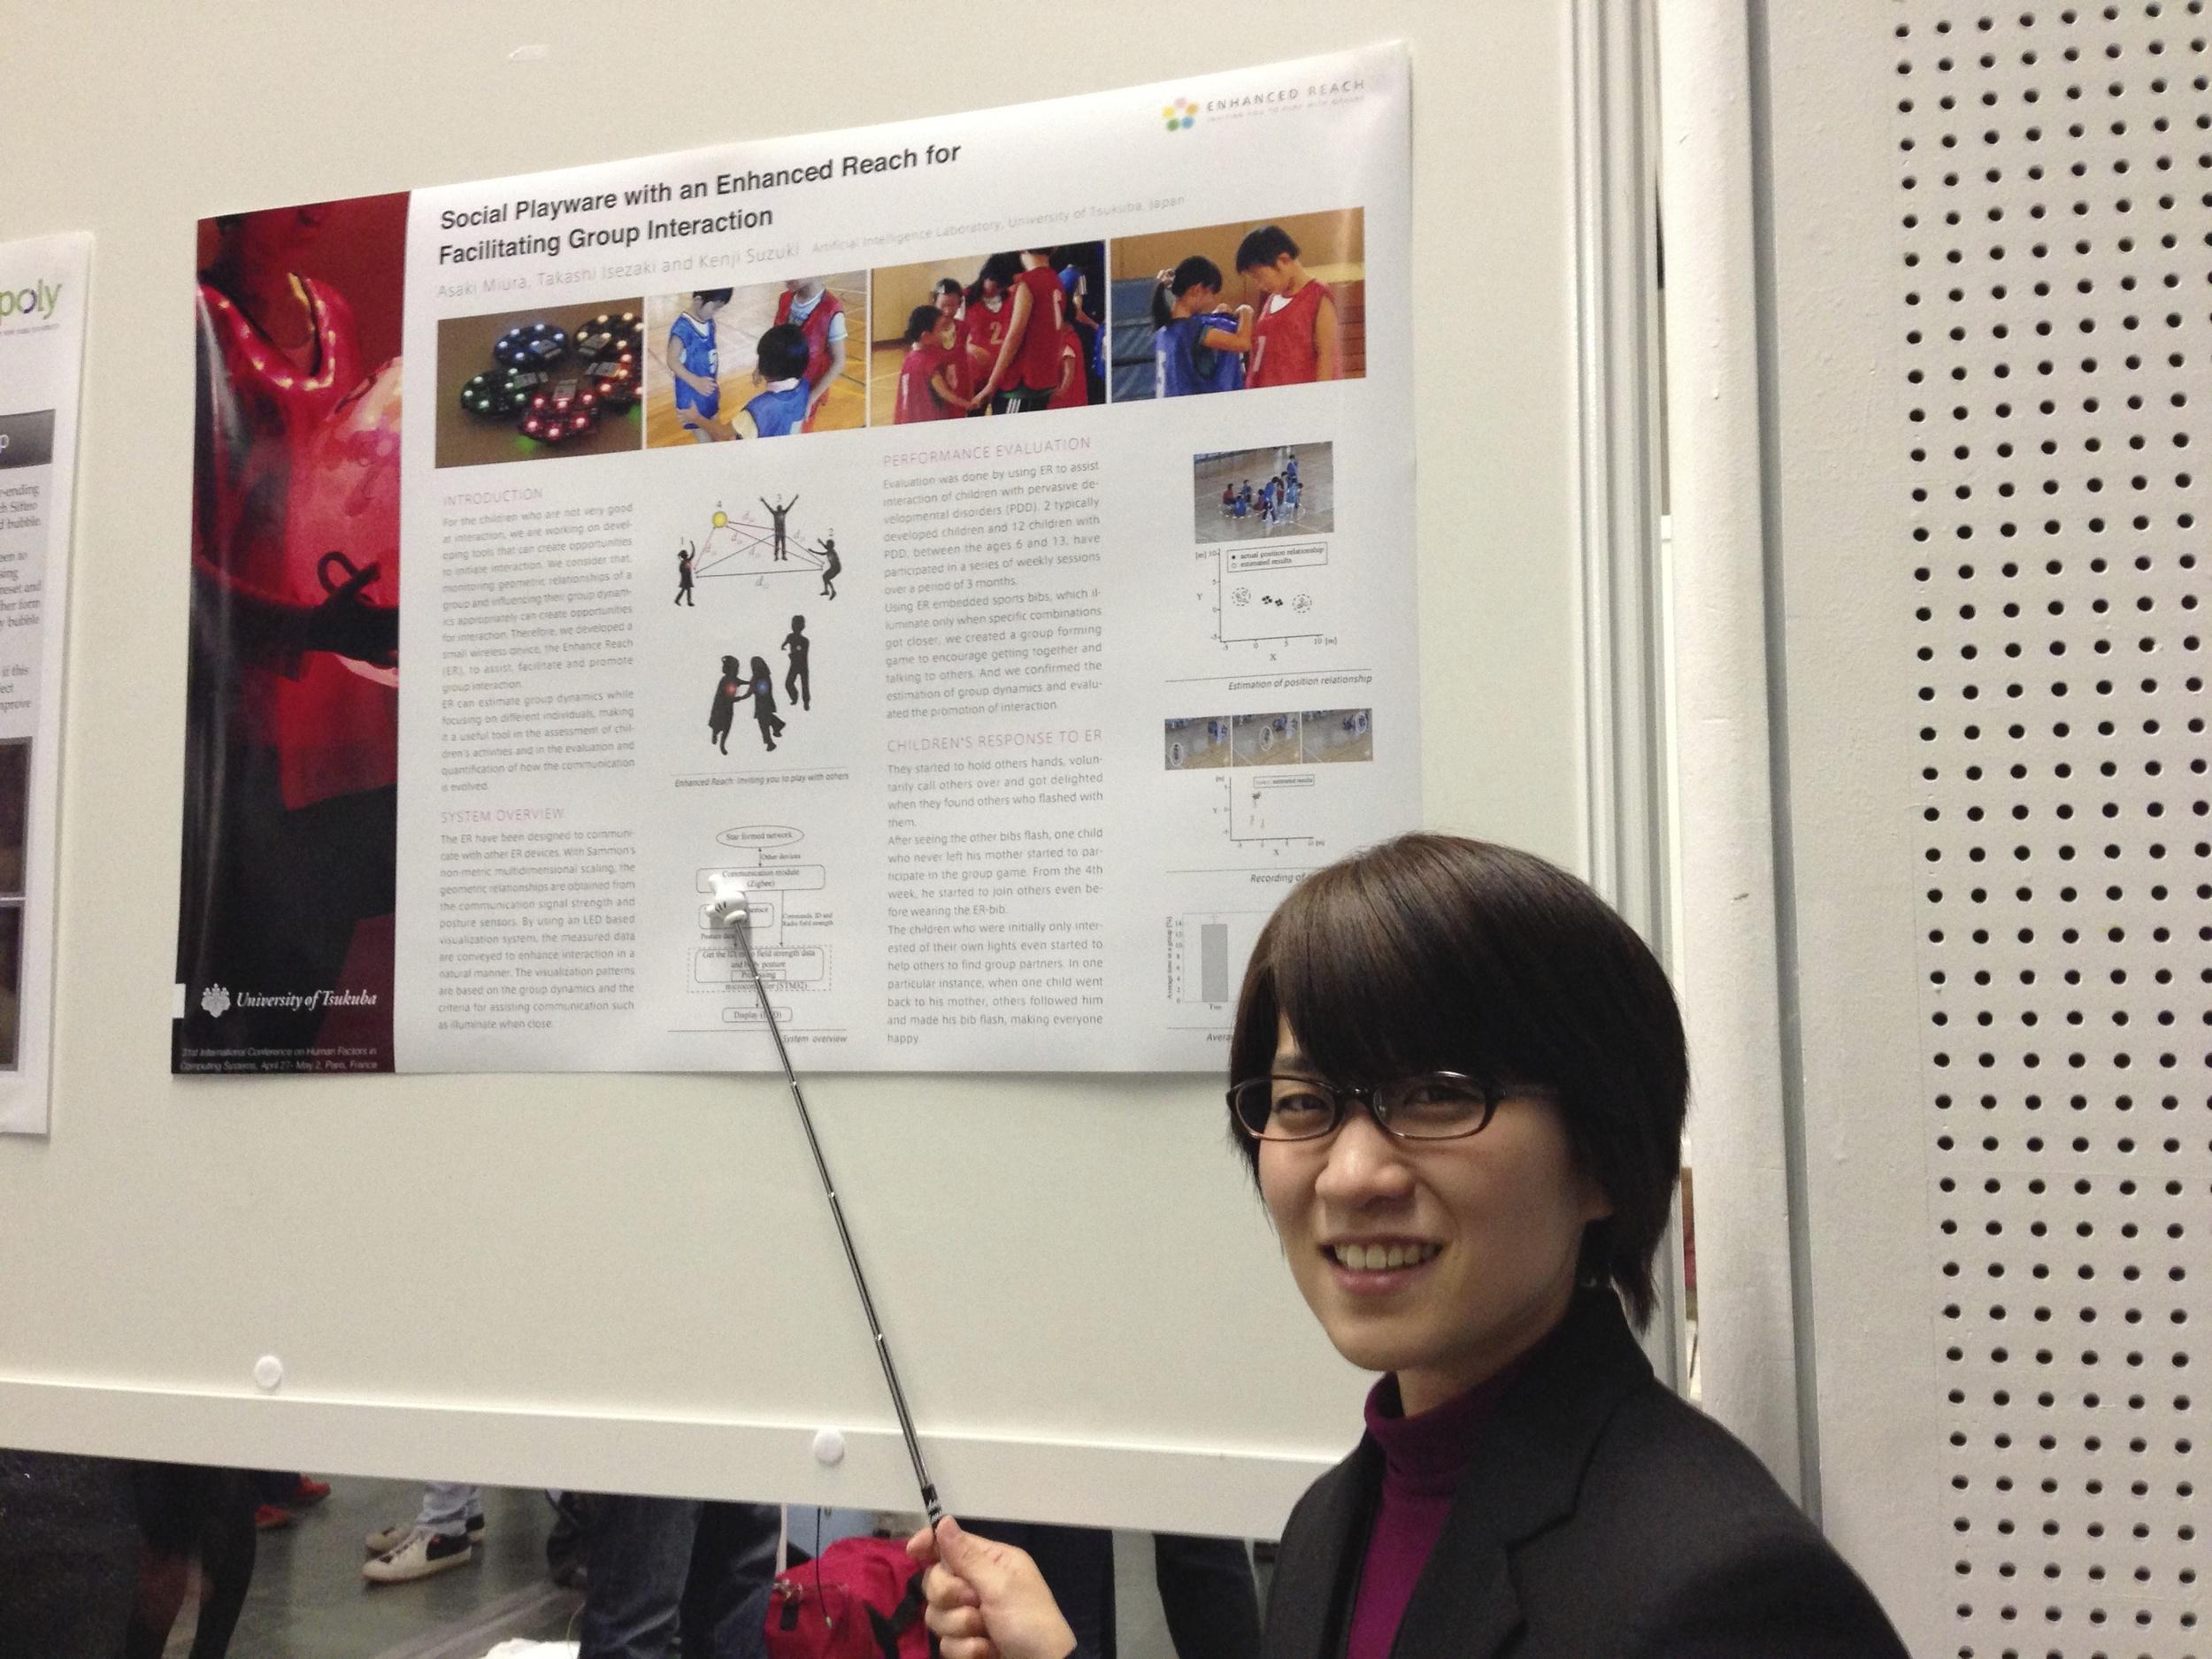 My neighbor Asaki at the poster presentation